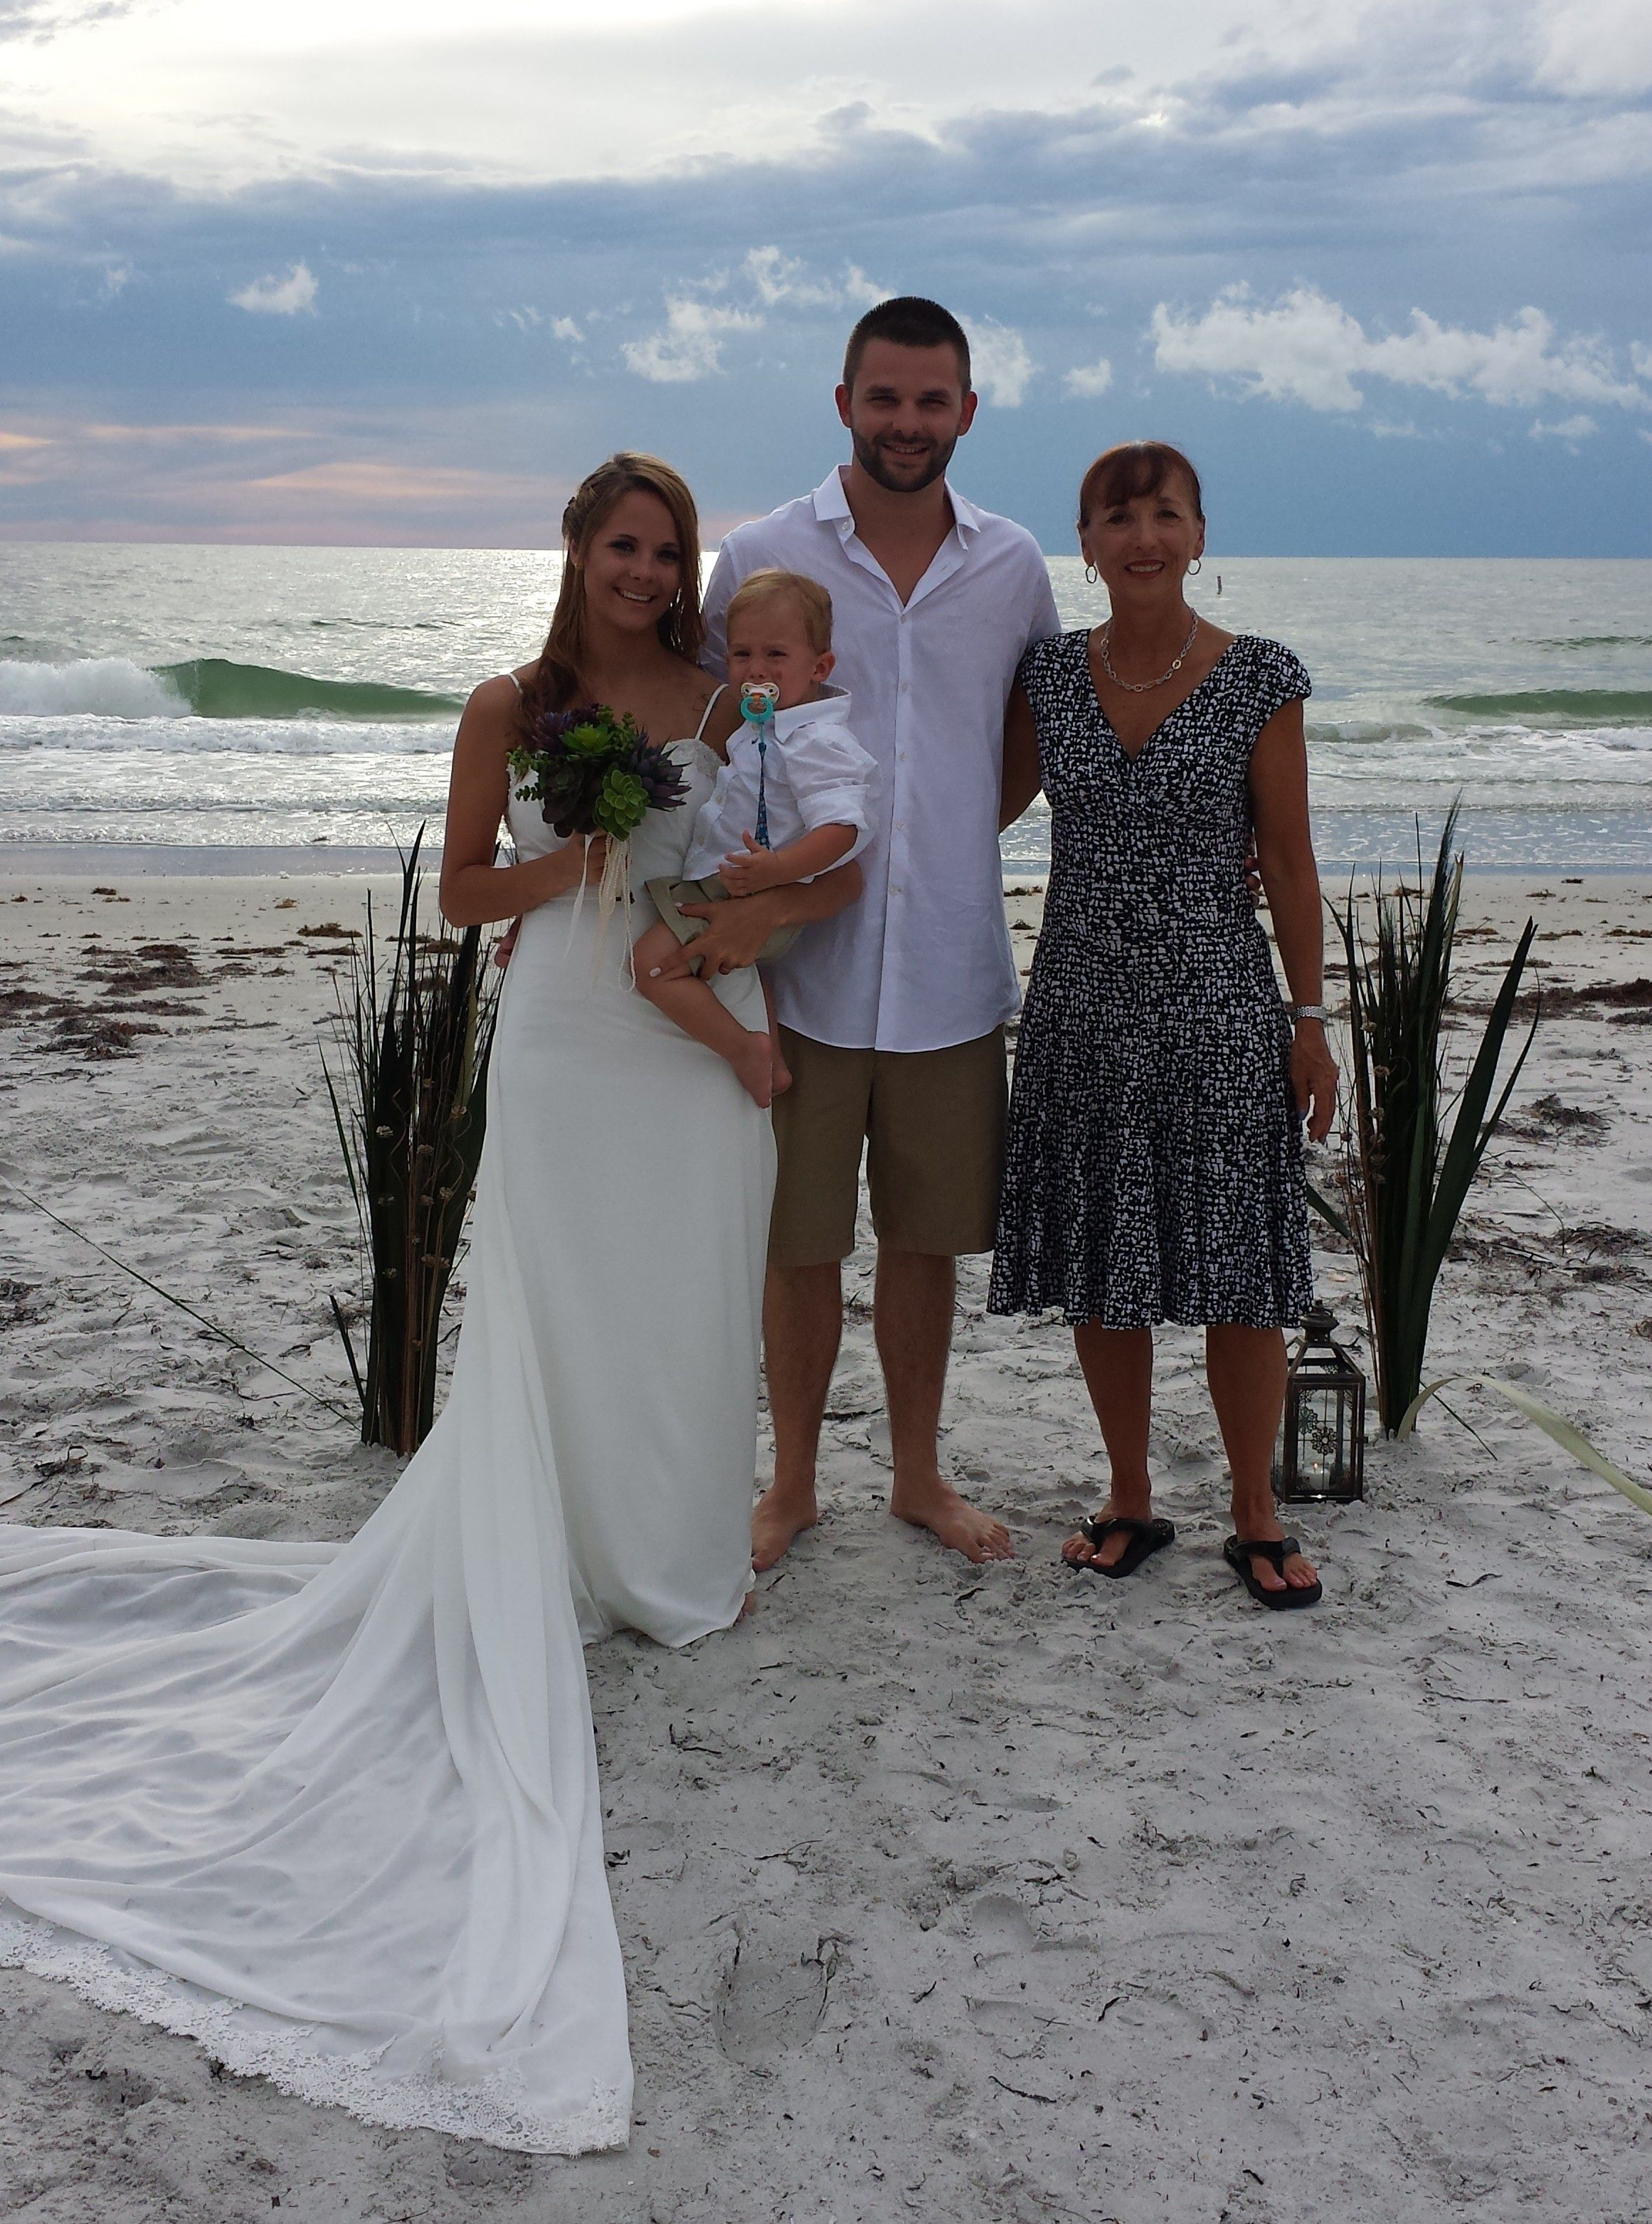 Indian Rocks Beach Wedding Ceremony